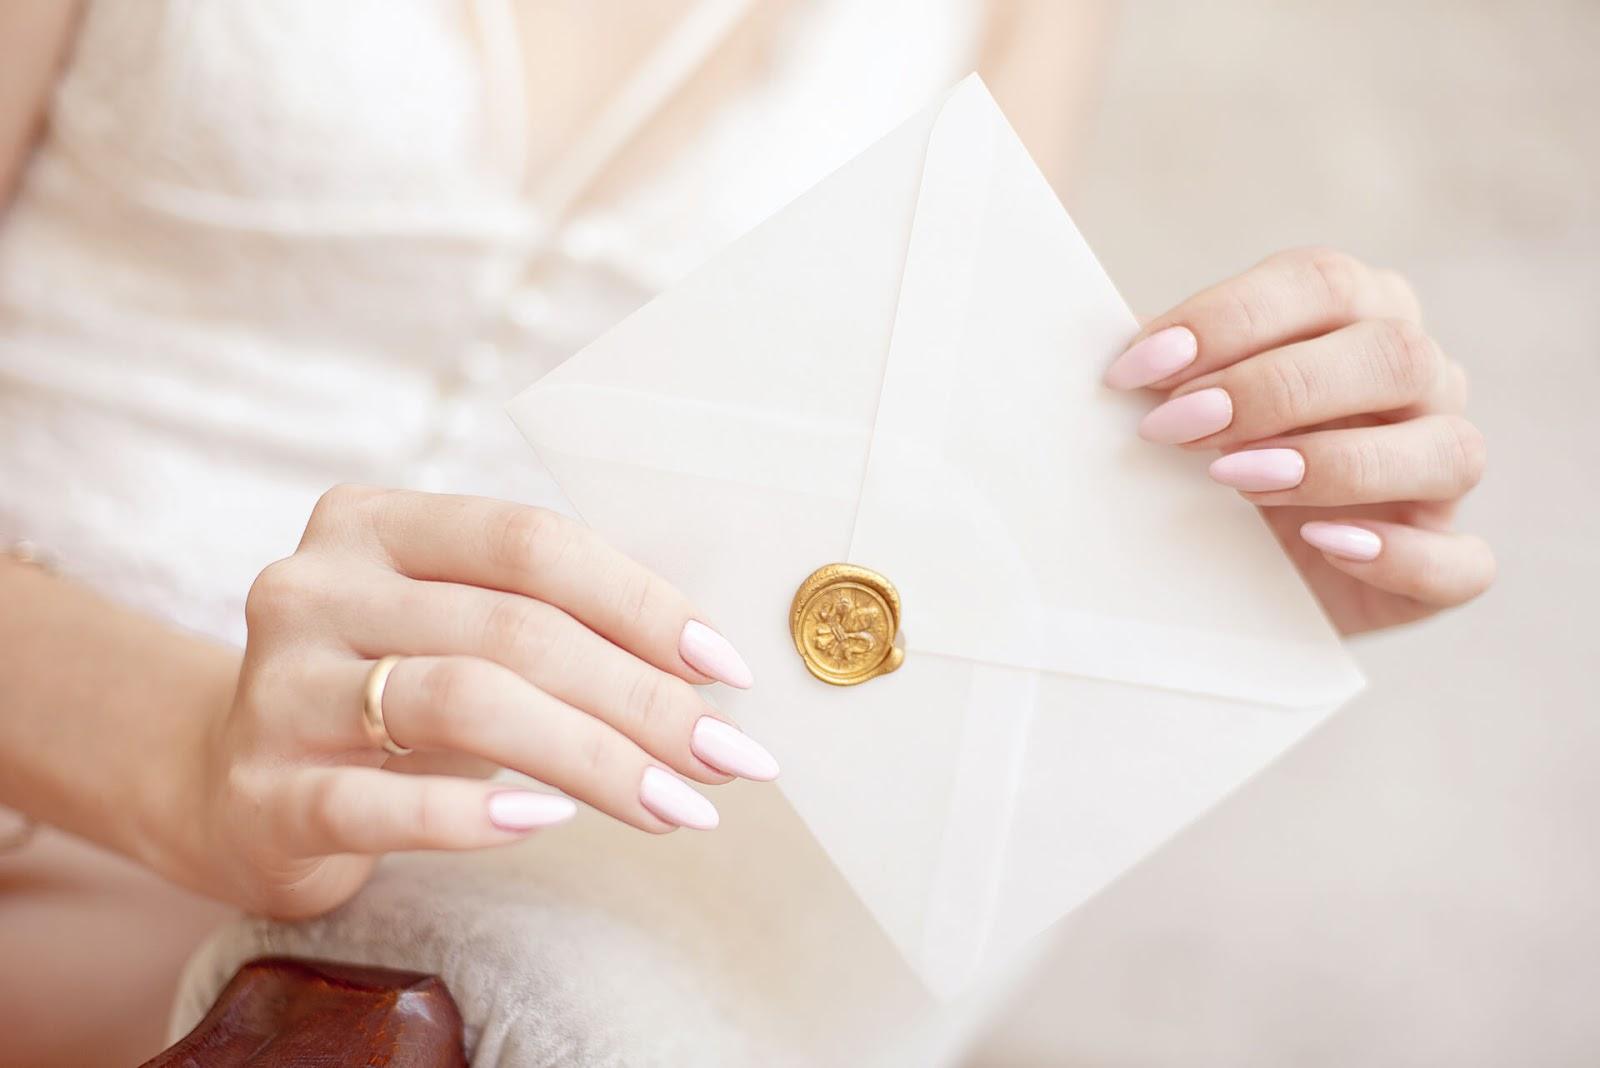 Hand holding an invitation